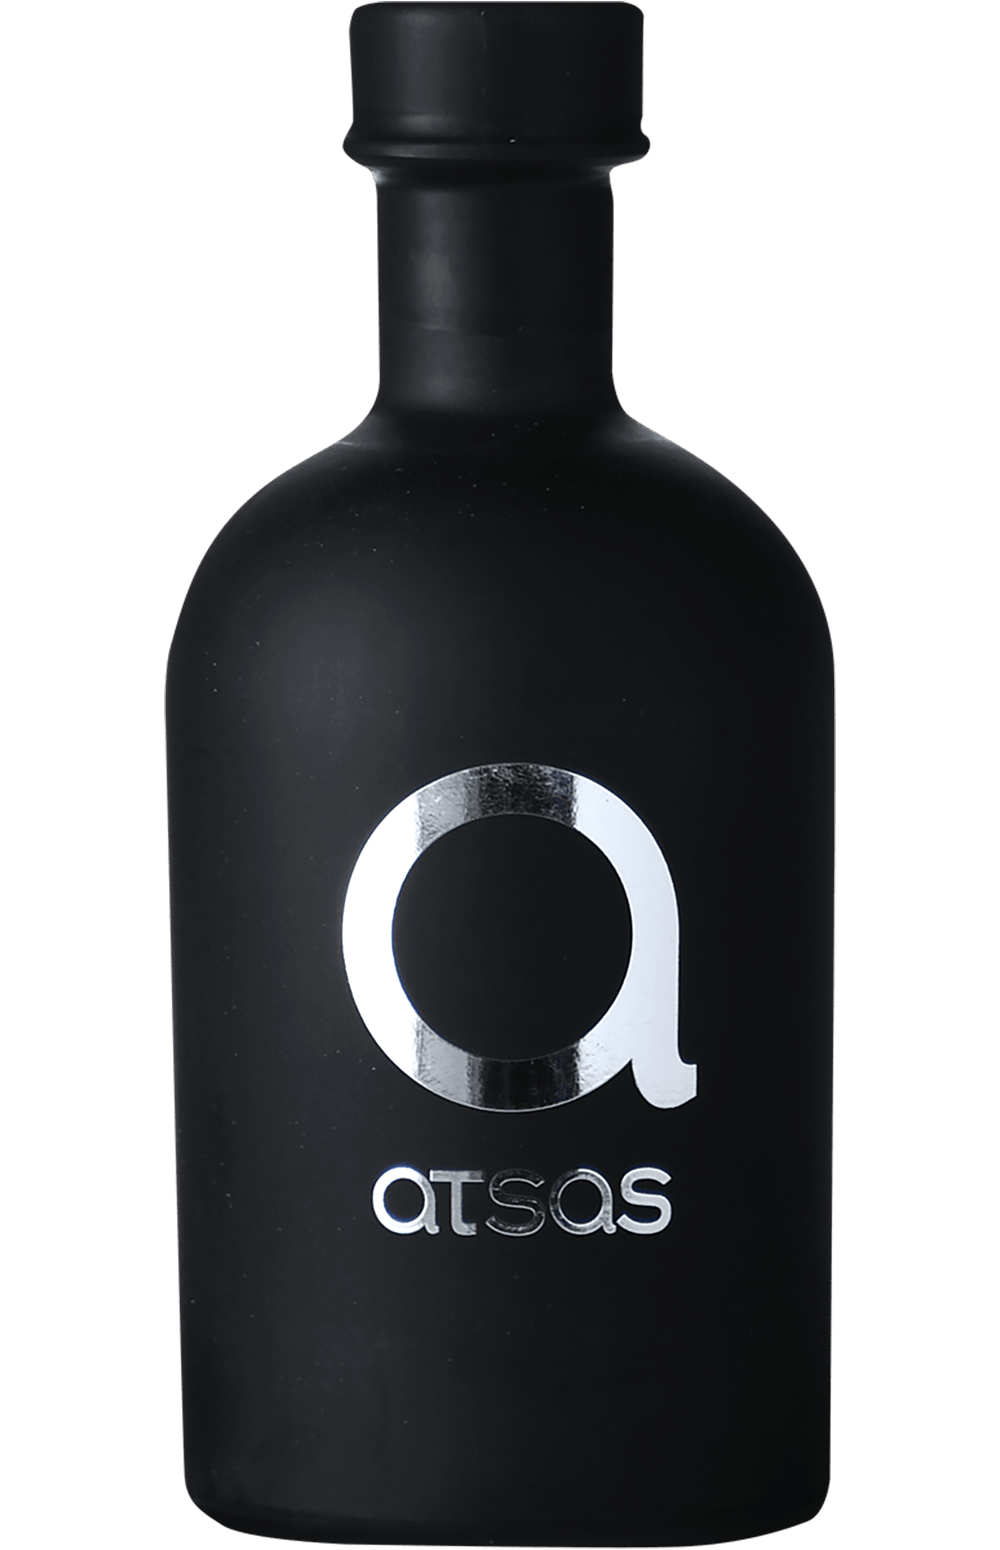 V. Atsas Organic Products Ltd